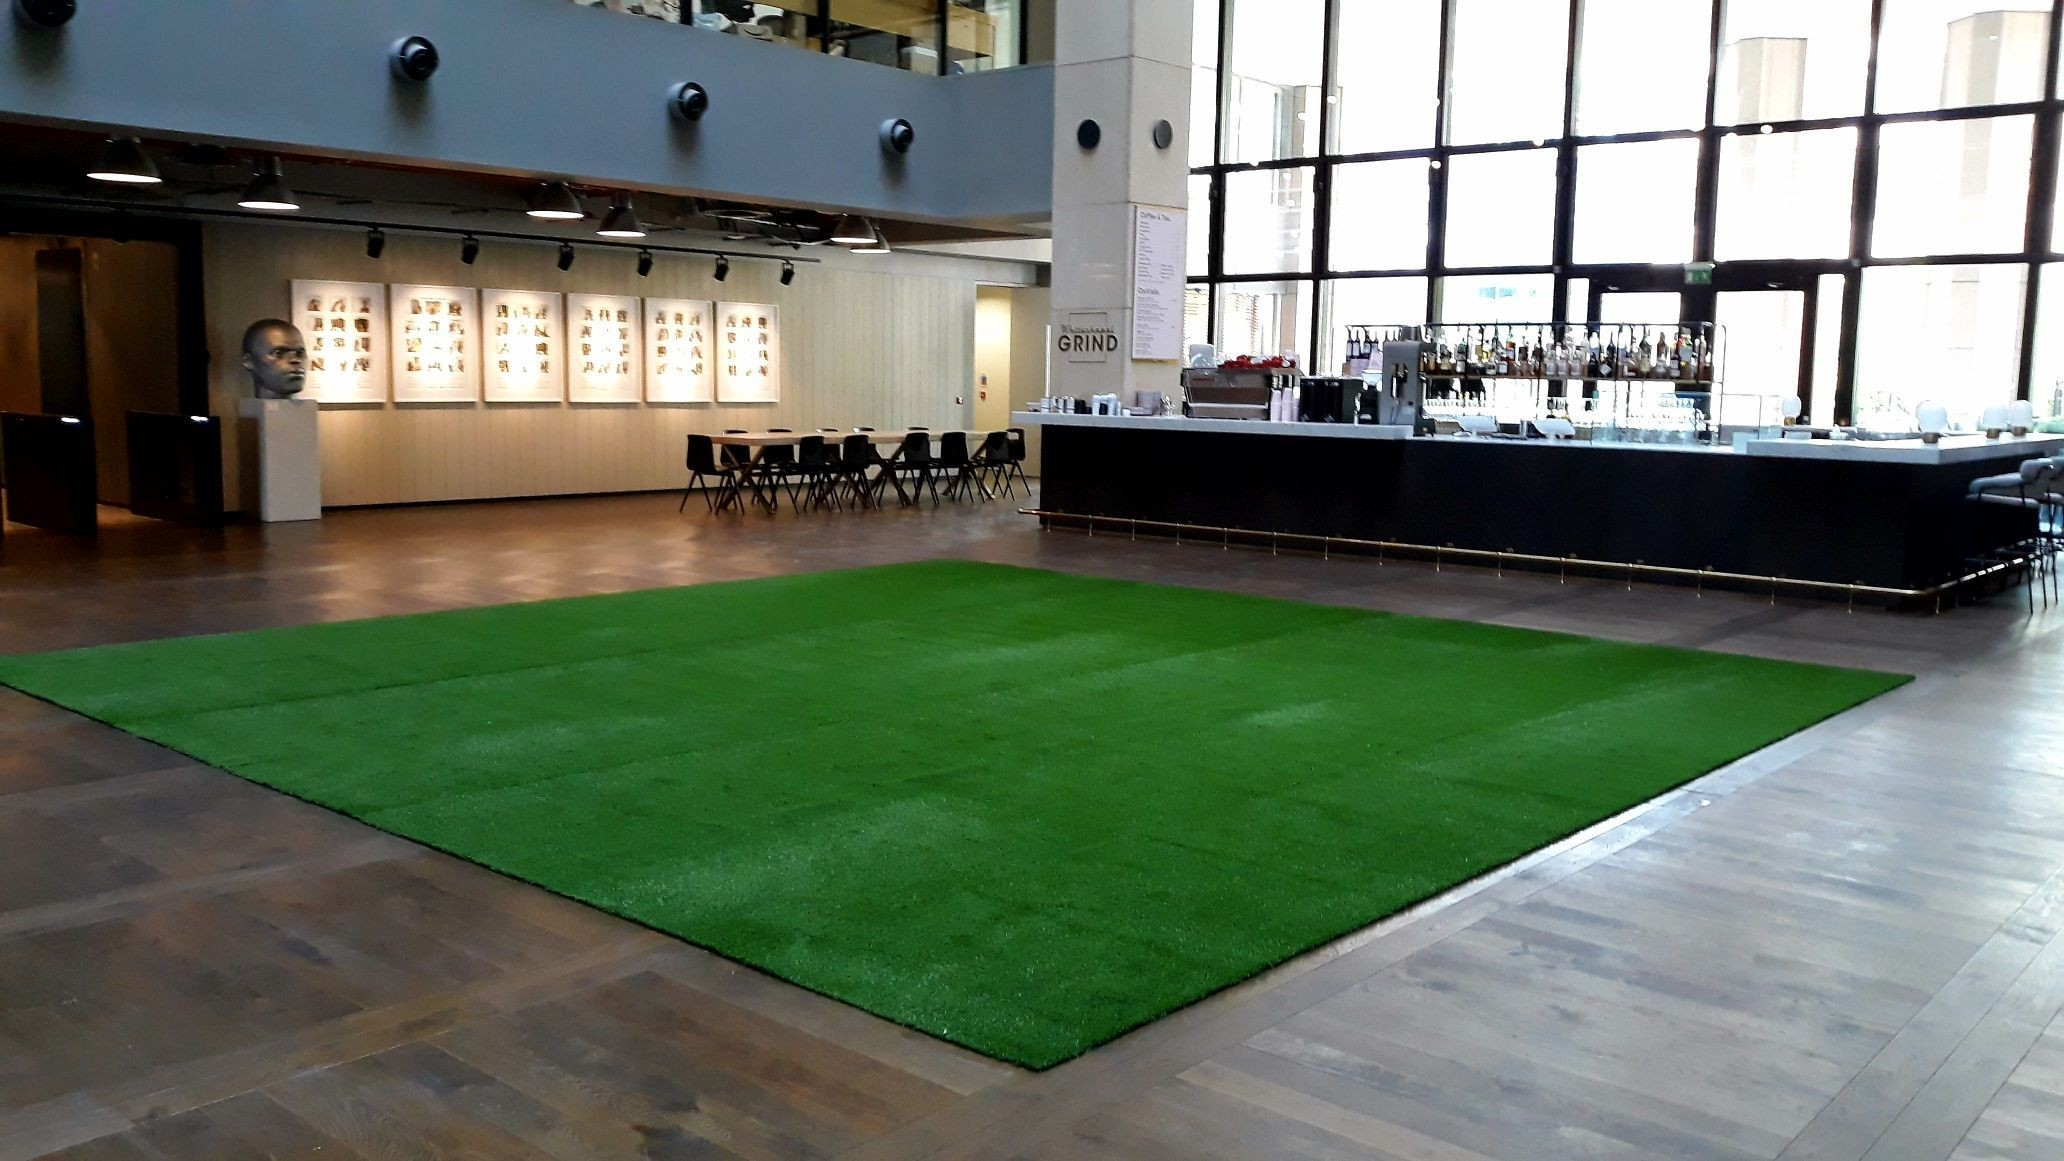 #ARTTRAGrass #artificialgrass installation for Derwent London in 10 Whitechapel High Street